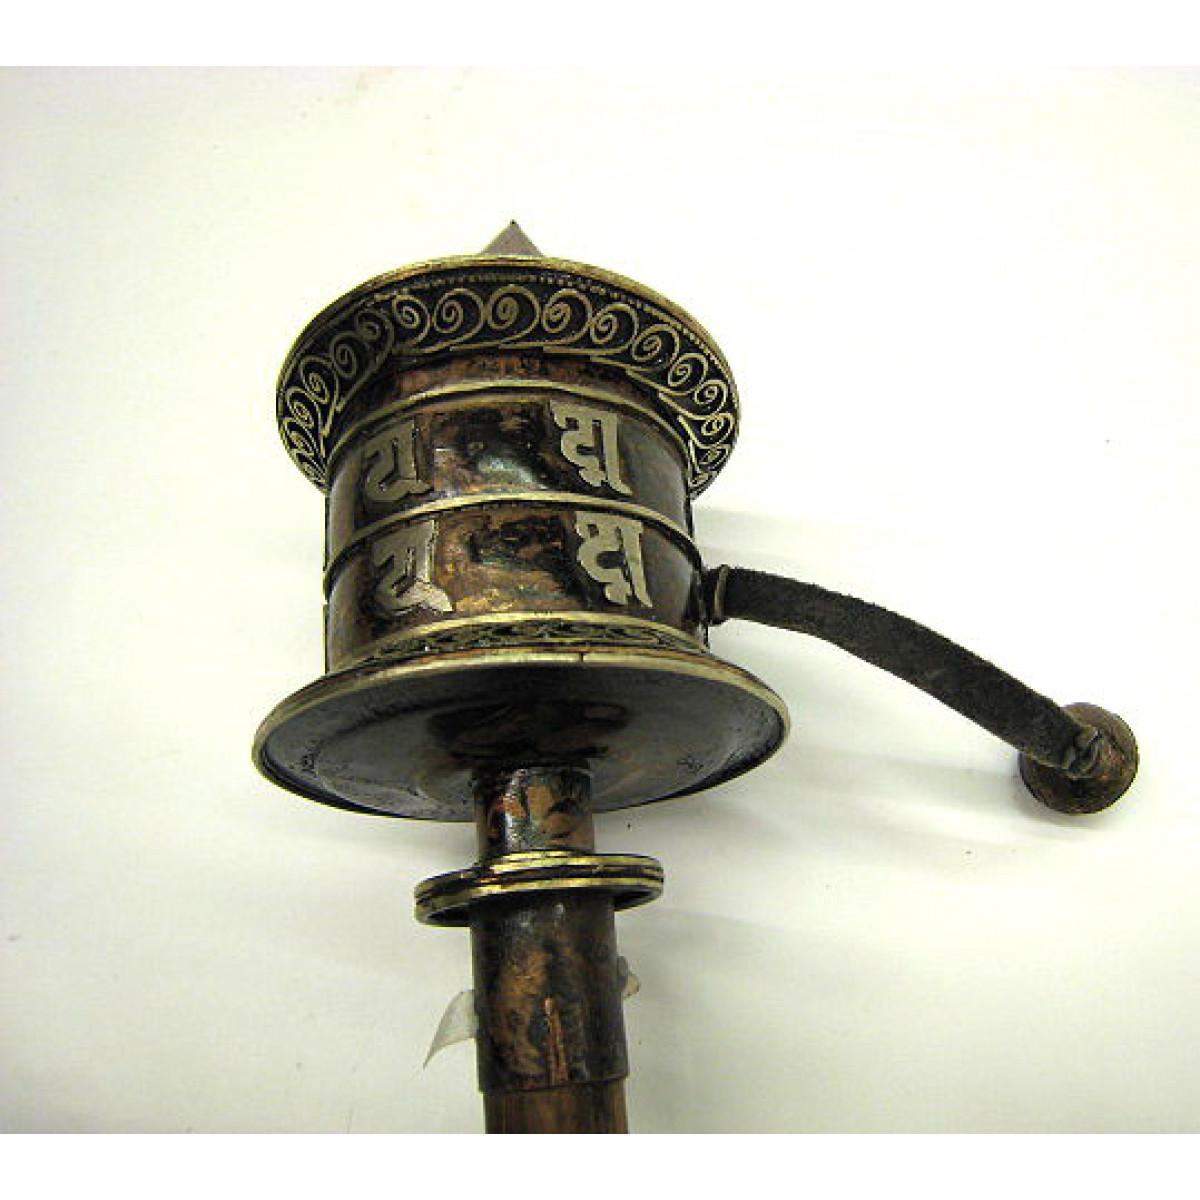 Prayer wheel Tibet. Mani script